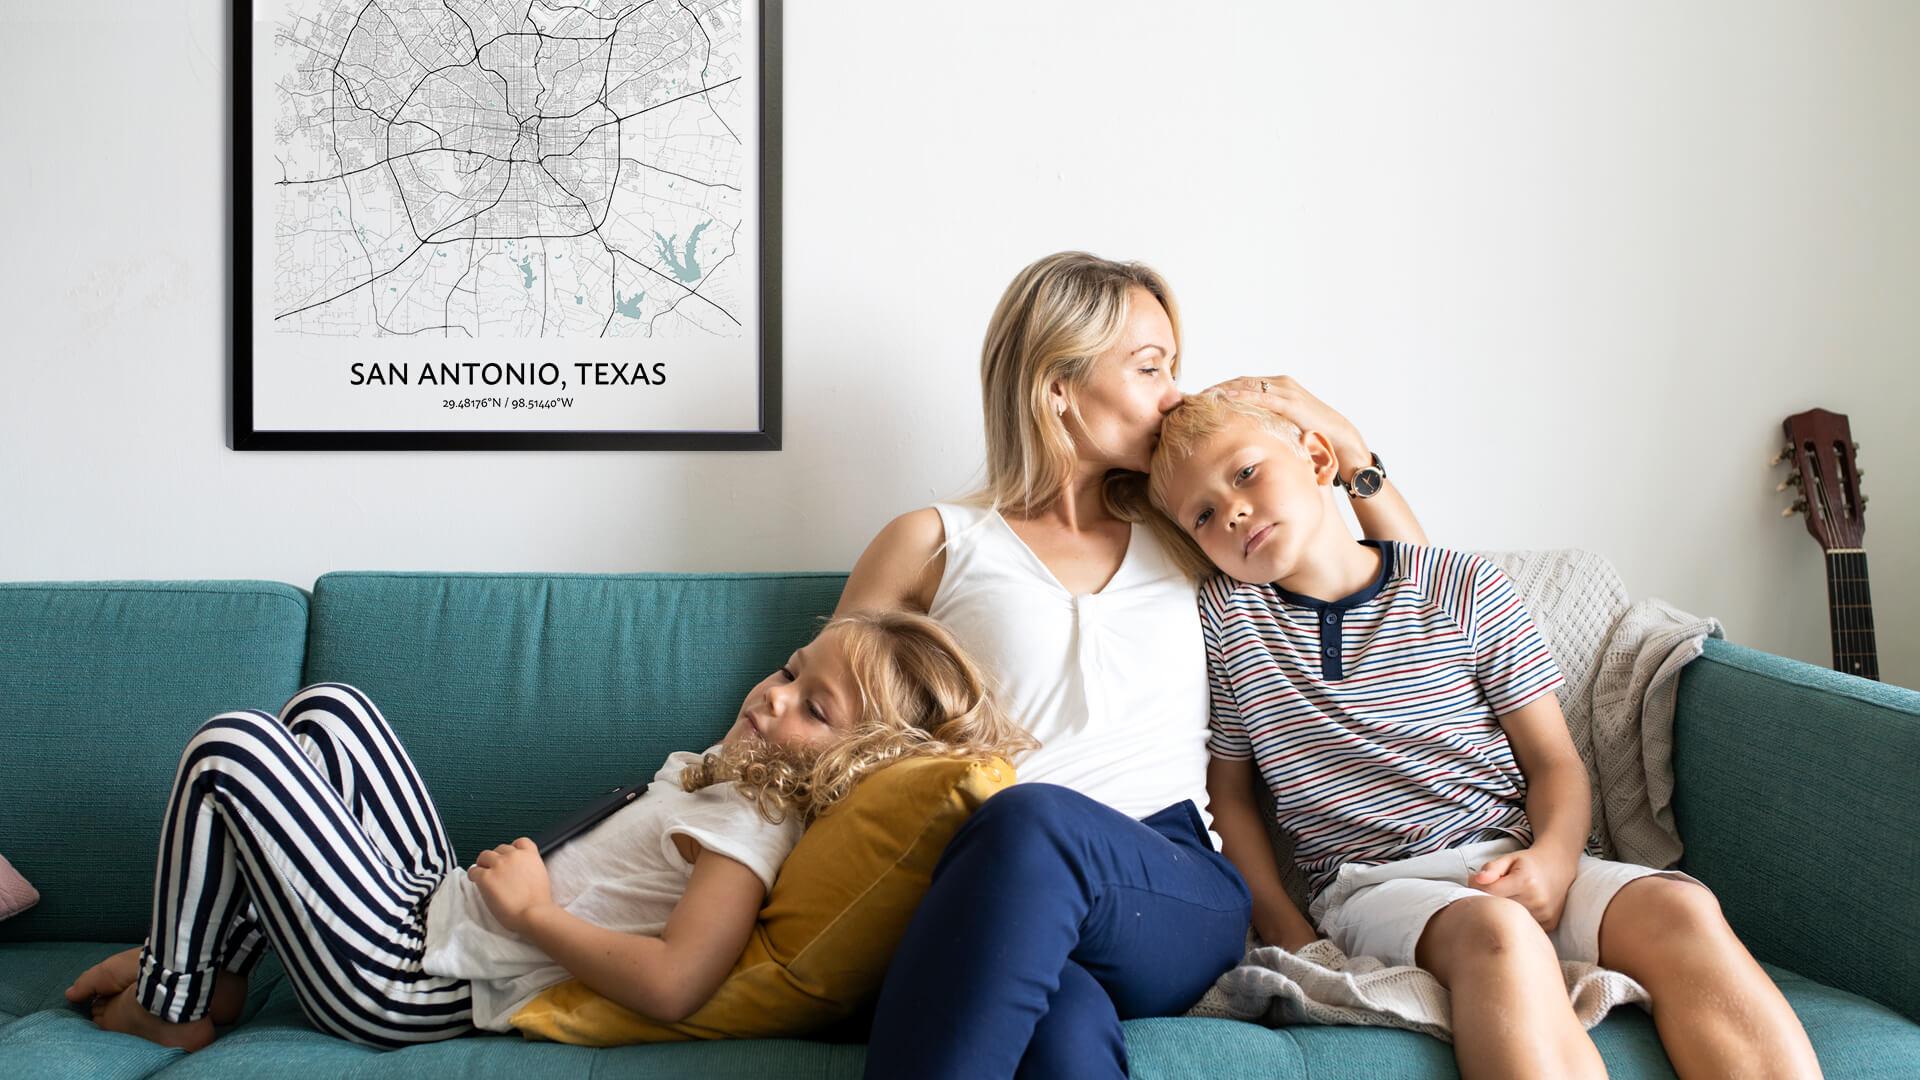 San Antonio map poster